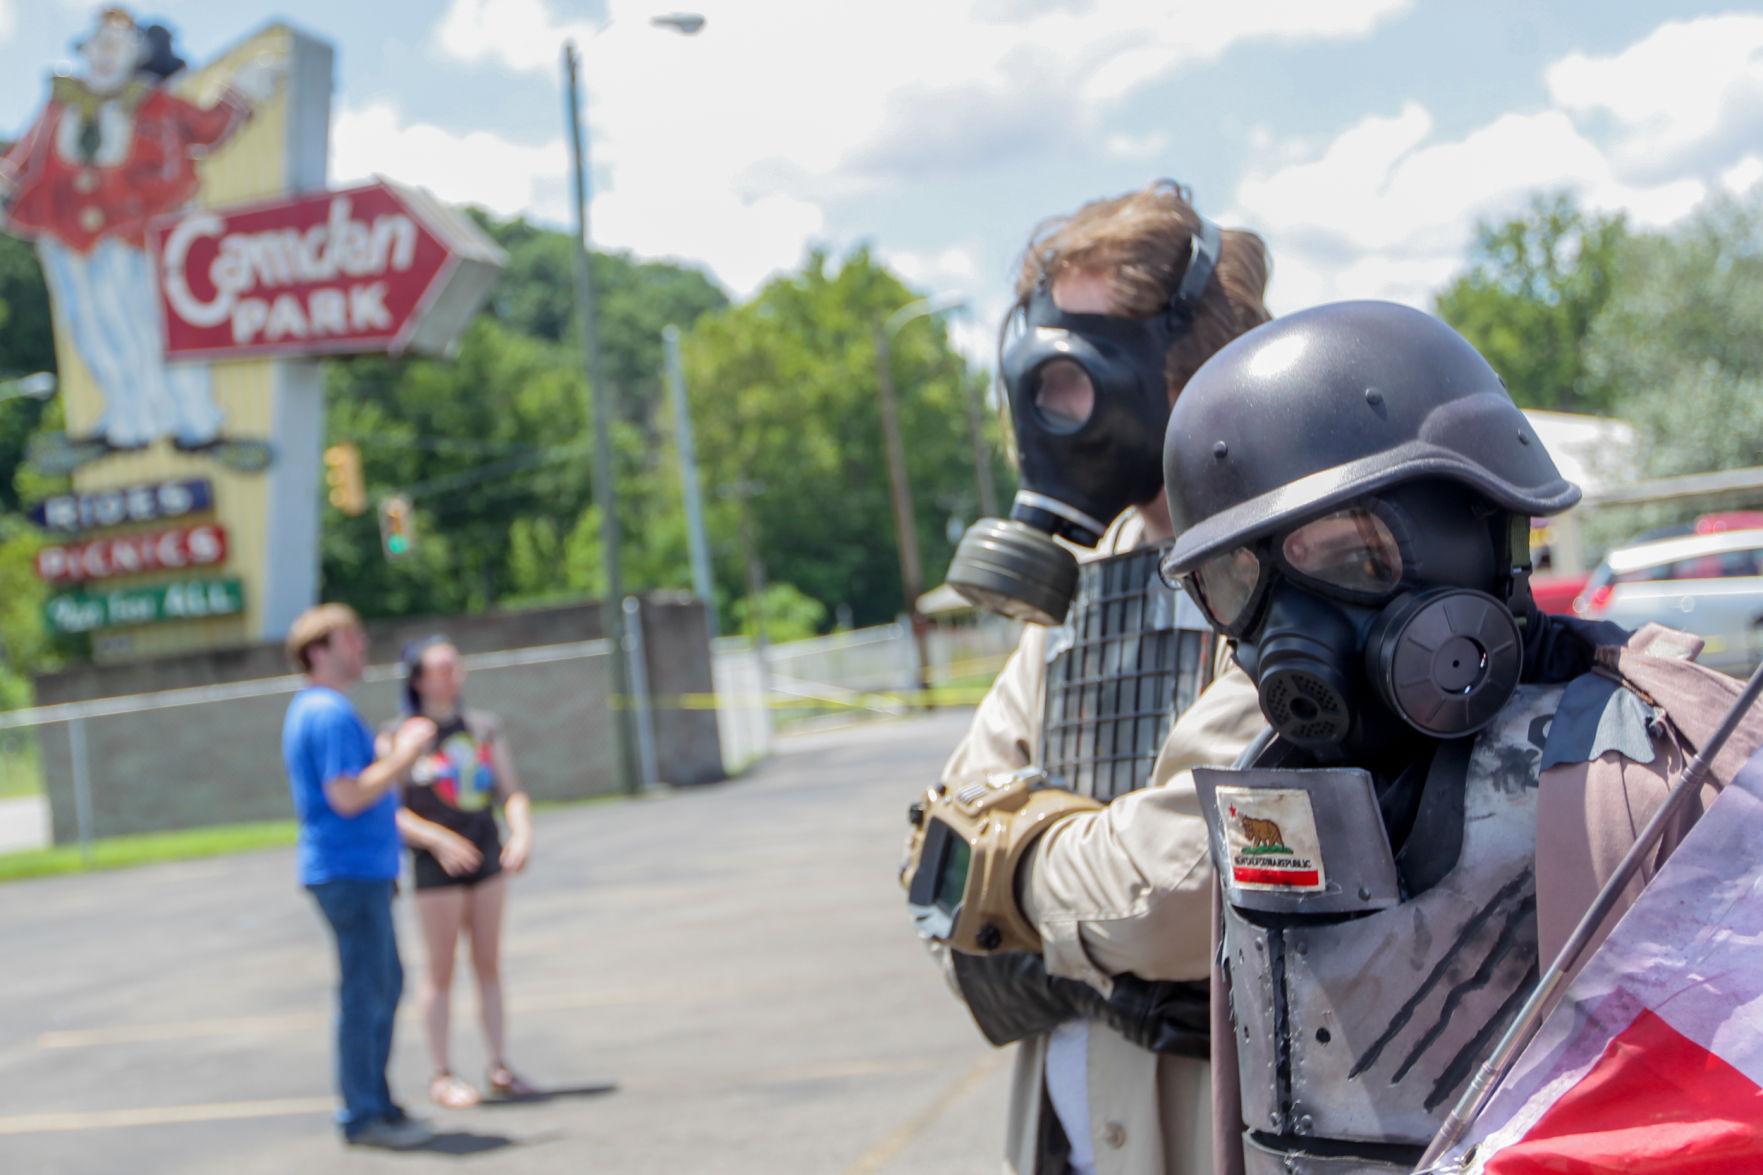 Photos Fallout 76 Fans Meet At Camden Park Multimedia